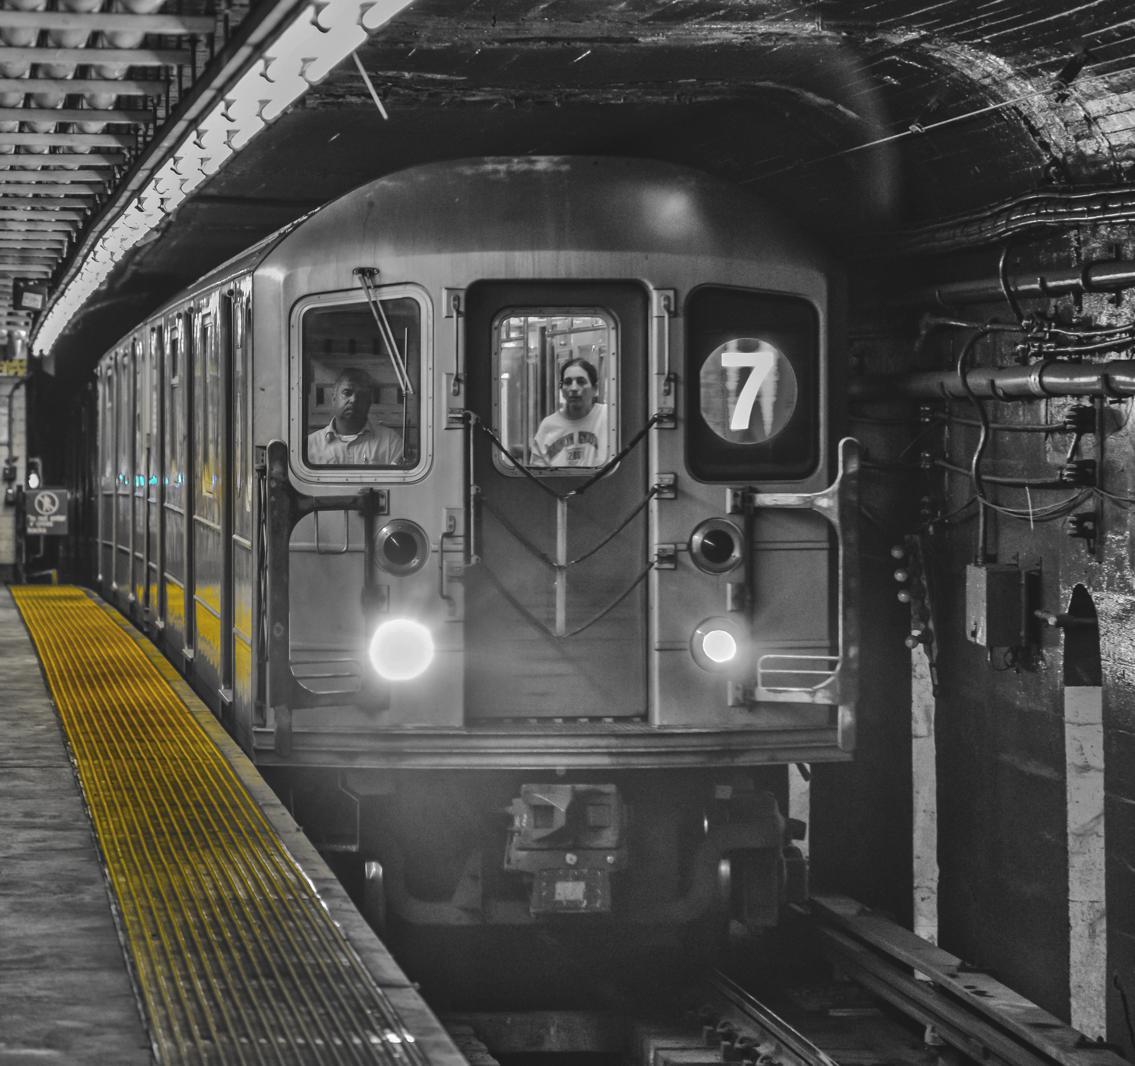 Vernon Blvd / Jackson Ave 7 Train